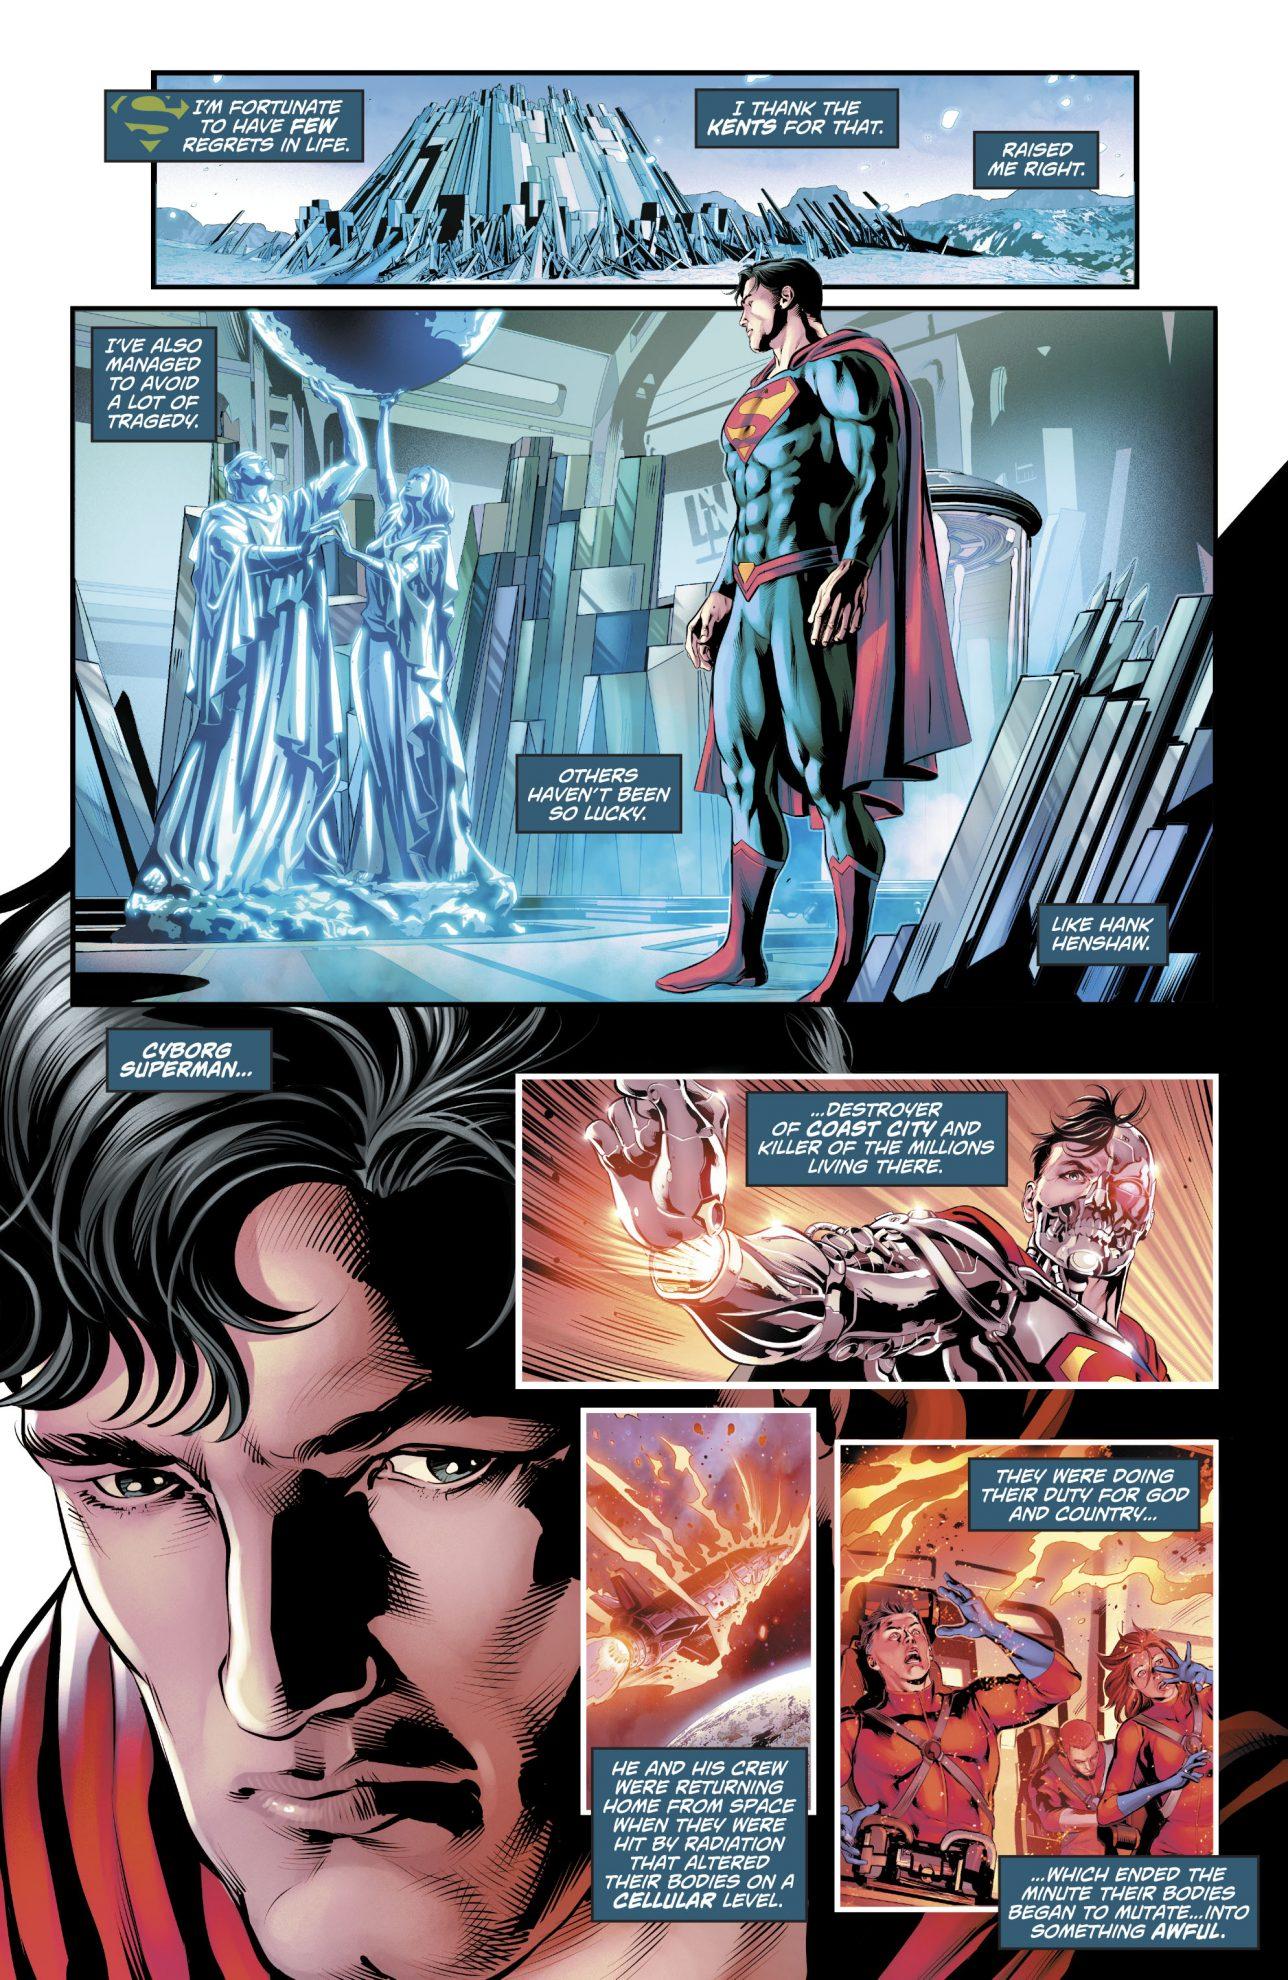 Why Superman Feels Sorry For Cyborg-Superman